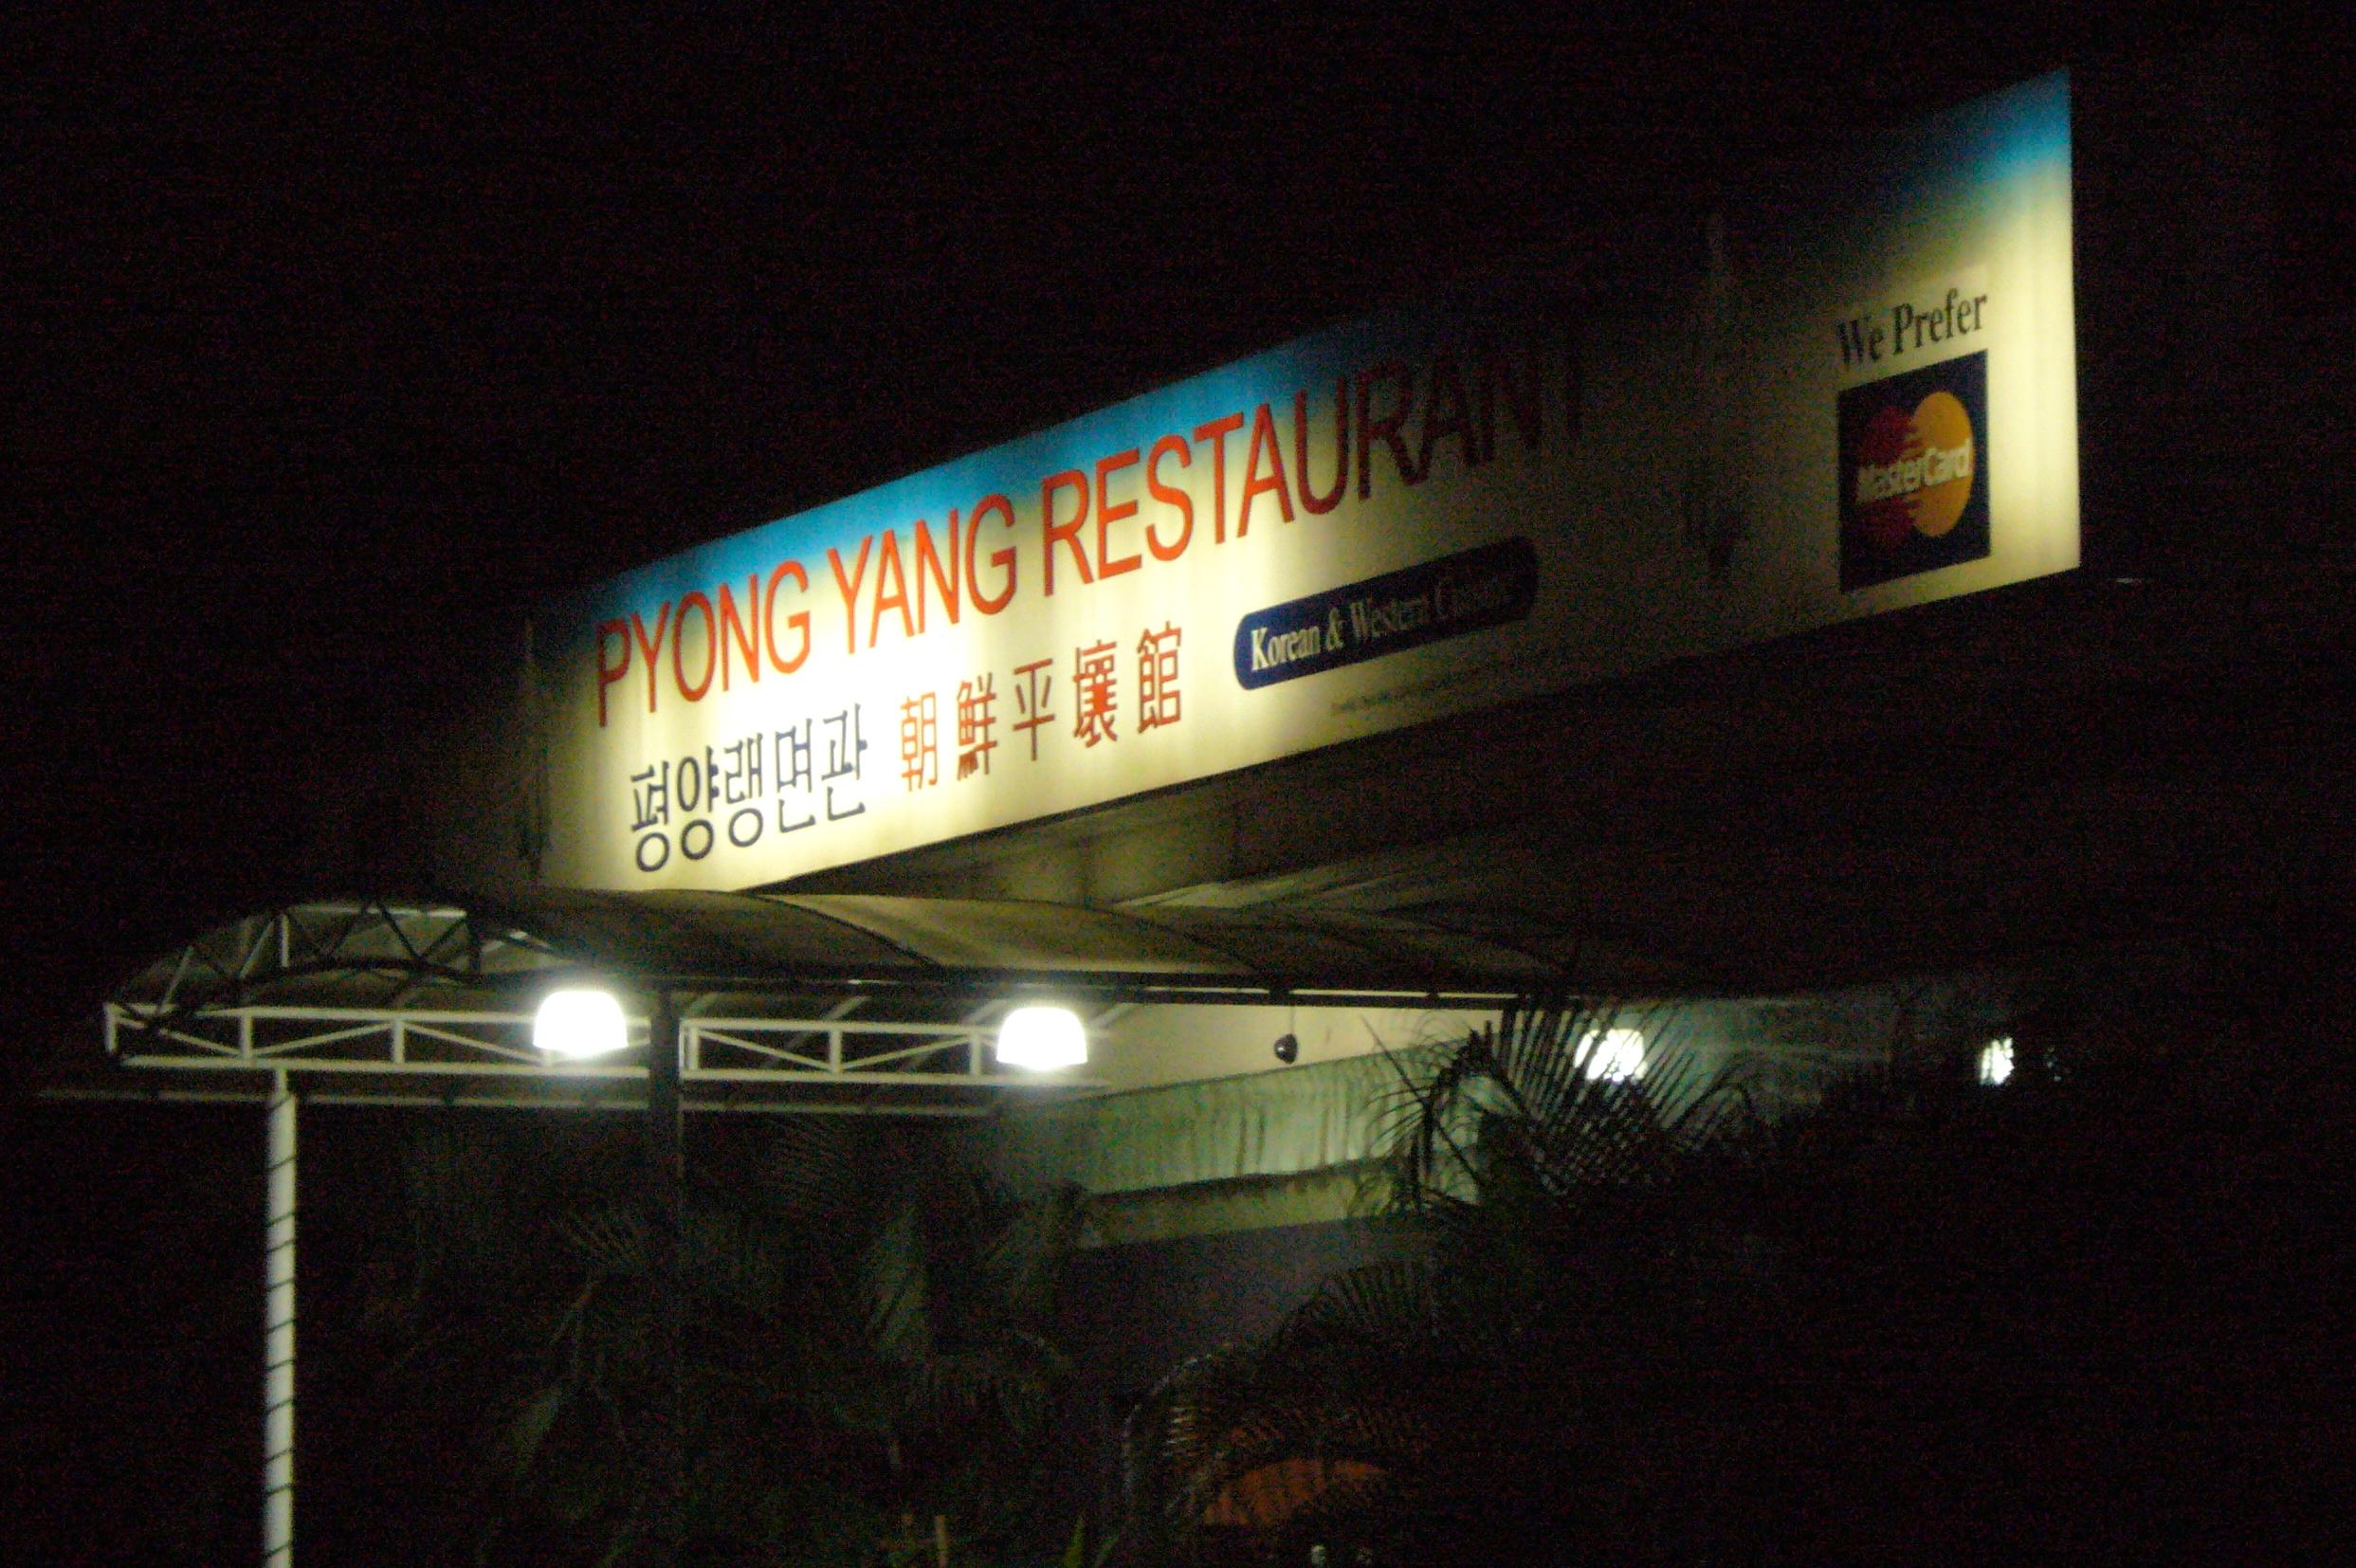 North Korean Restaurant Kl